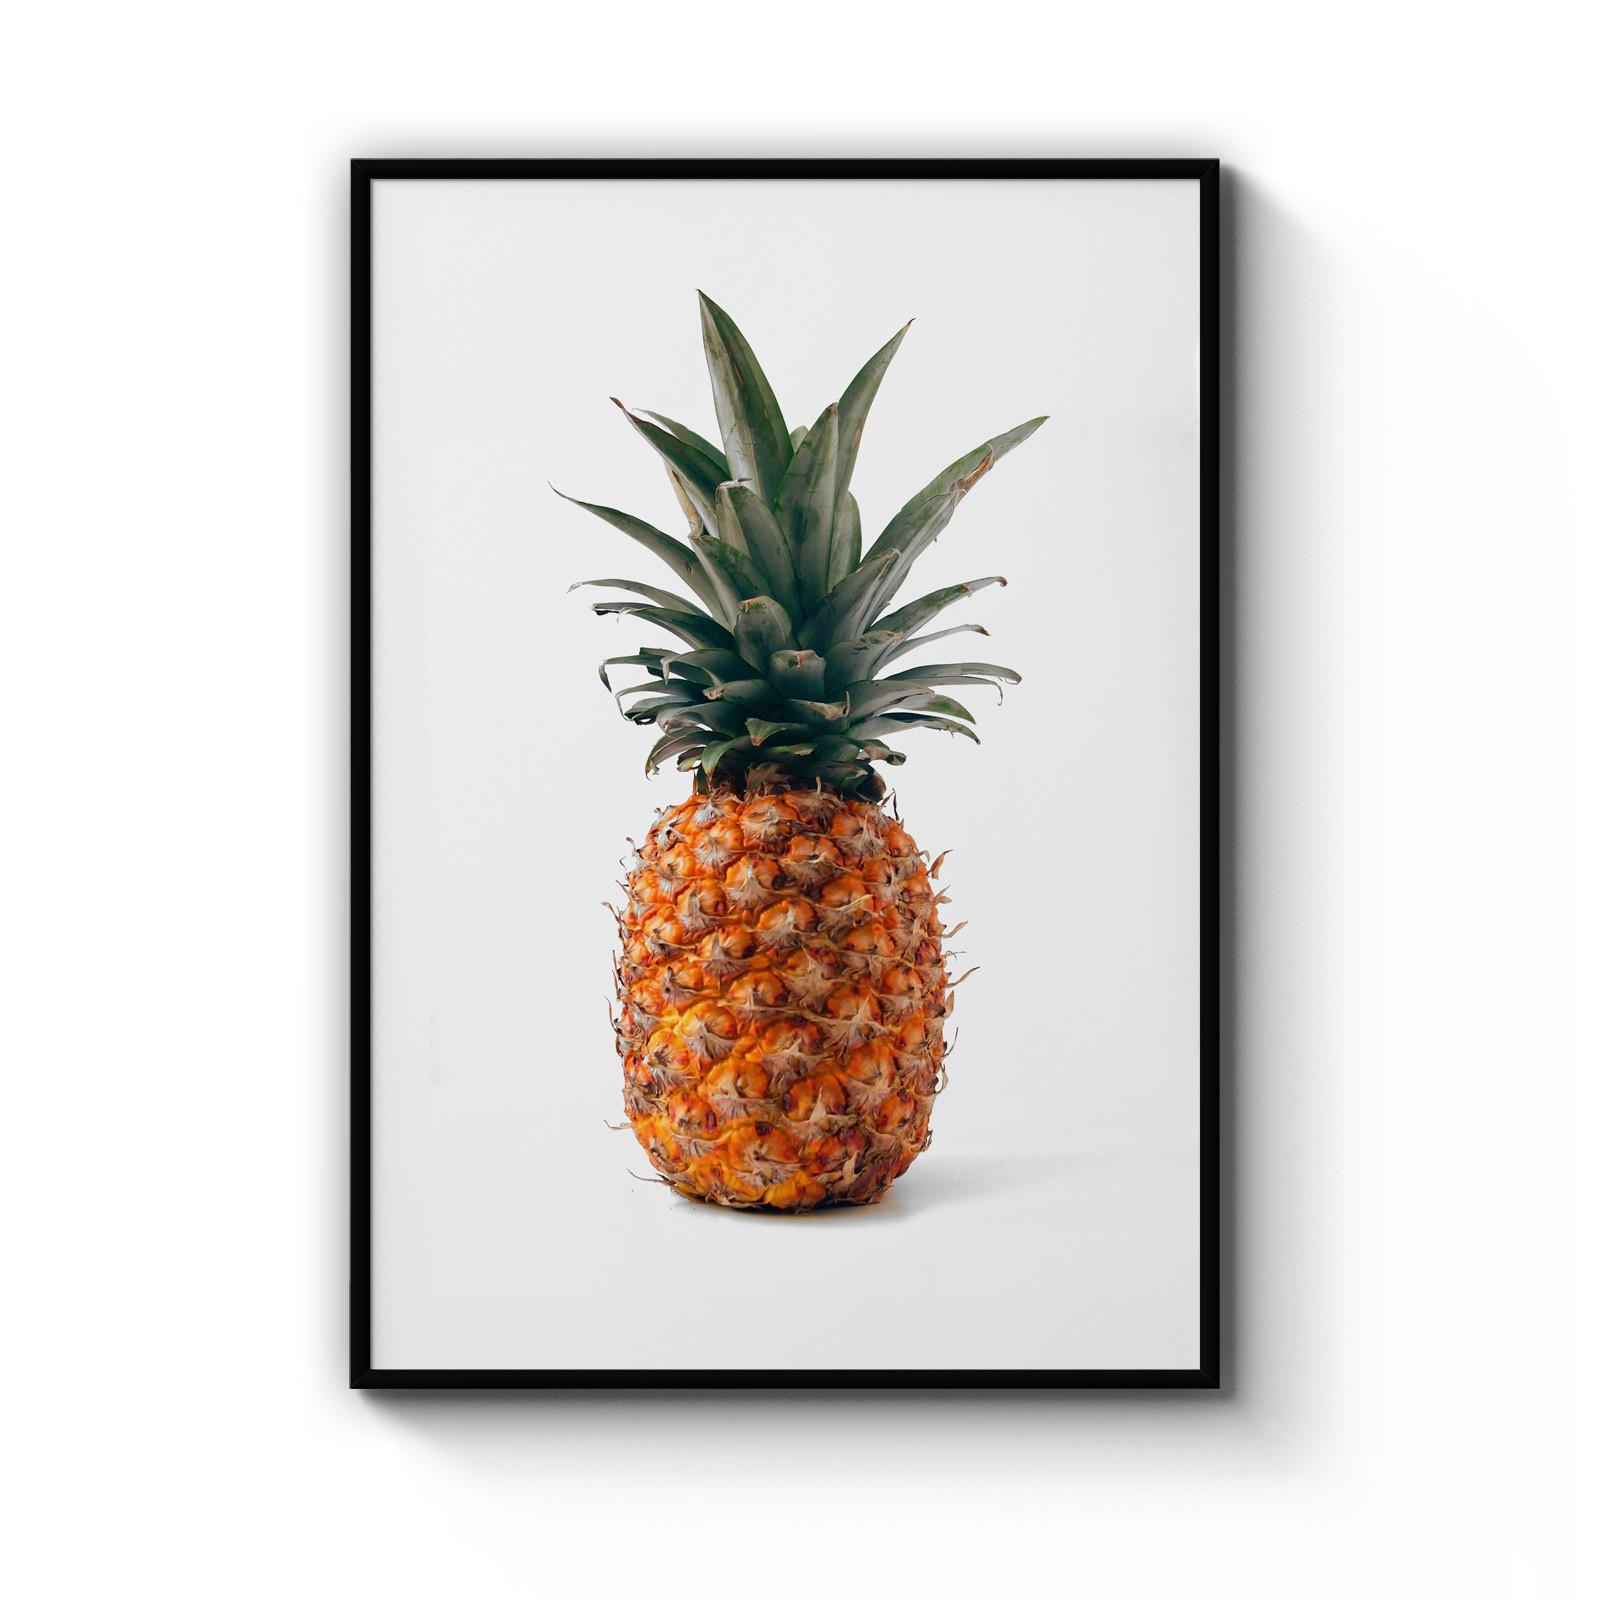 Minimal Pineapple Photograph Kitchen Decor Art Print Poster Size A4 - A0